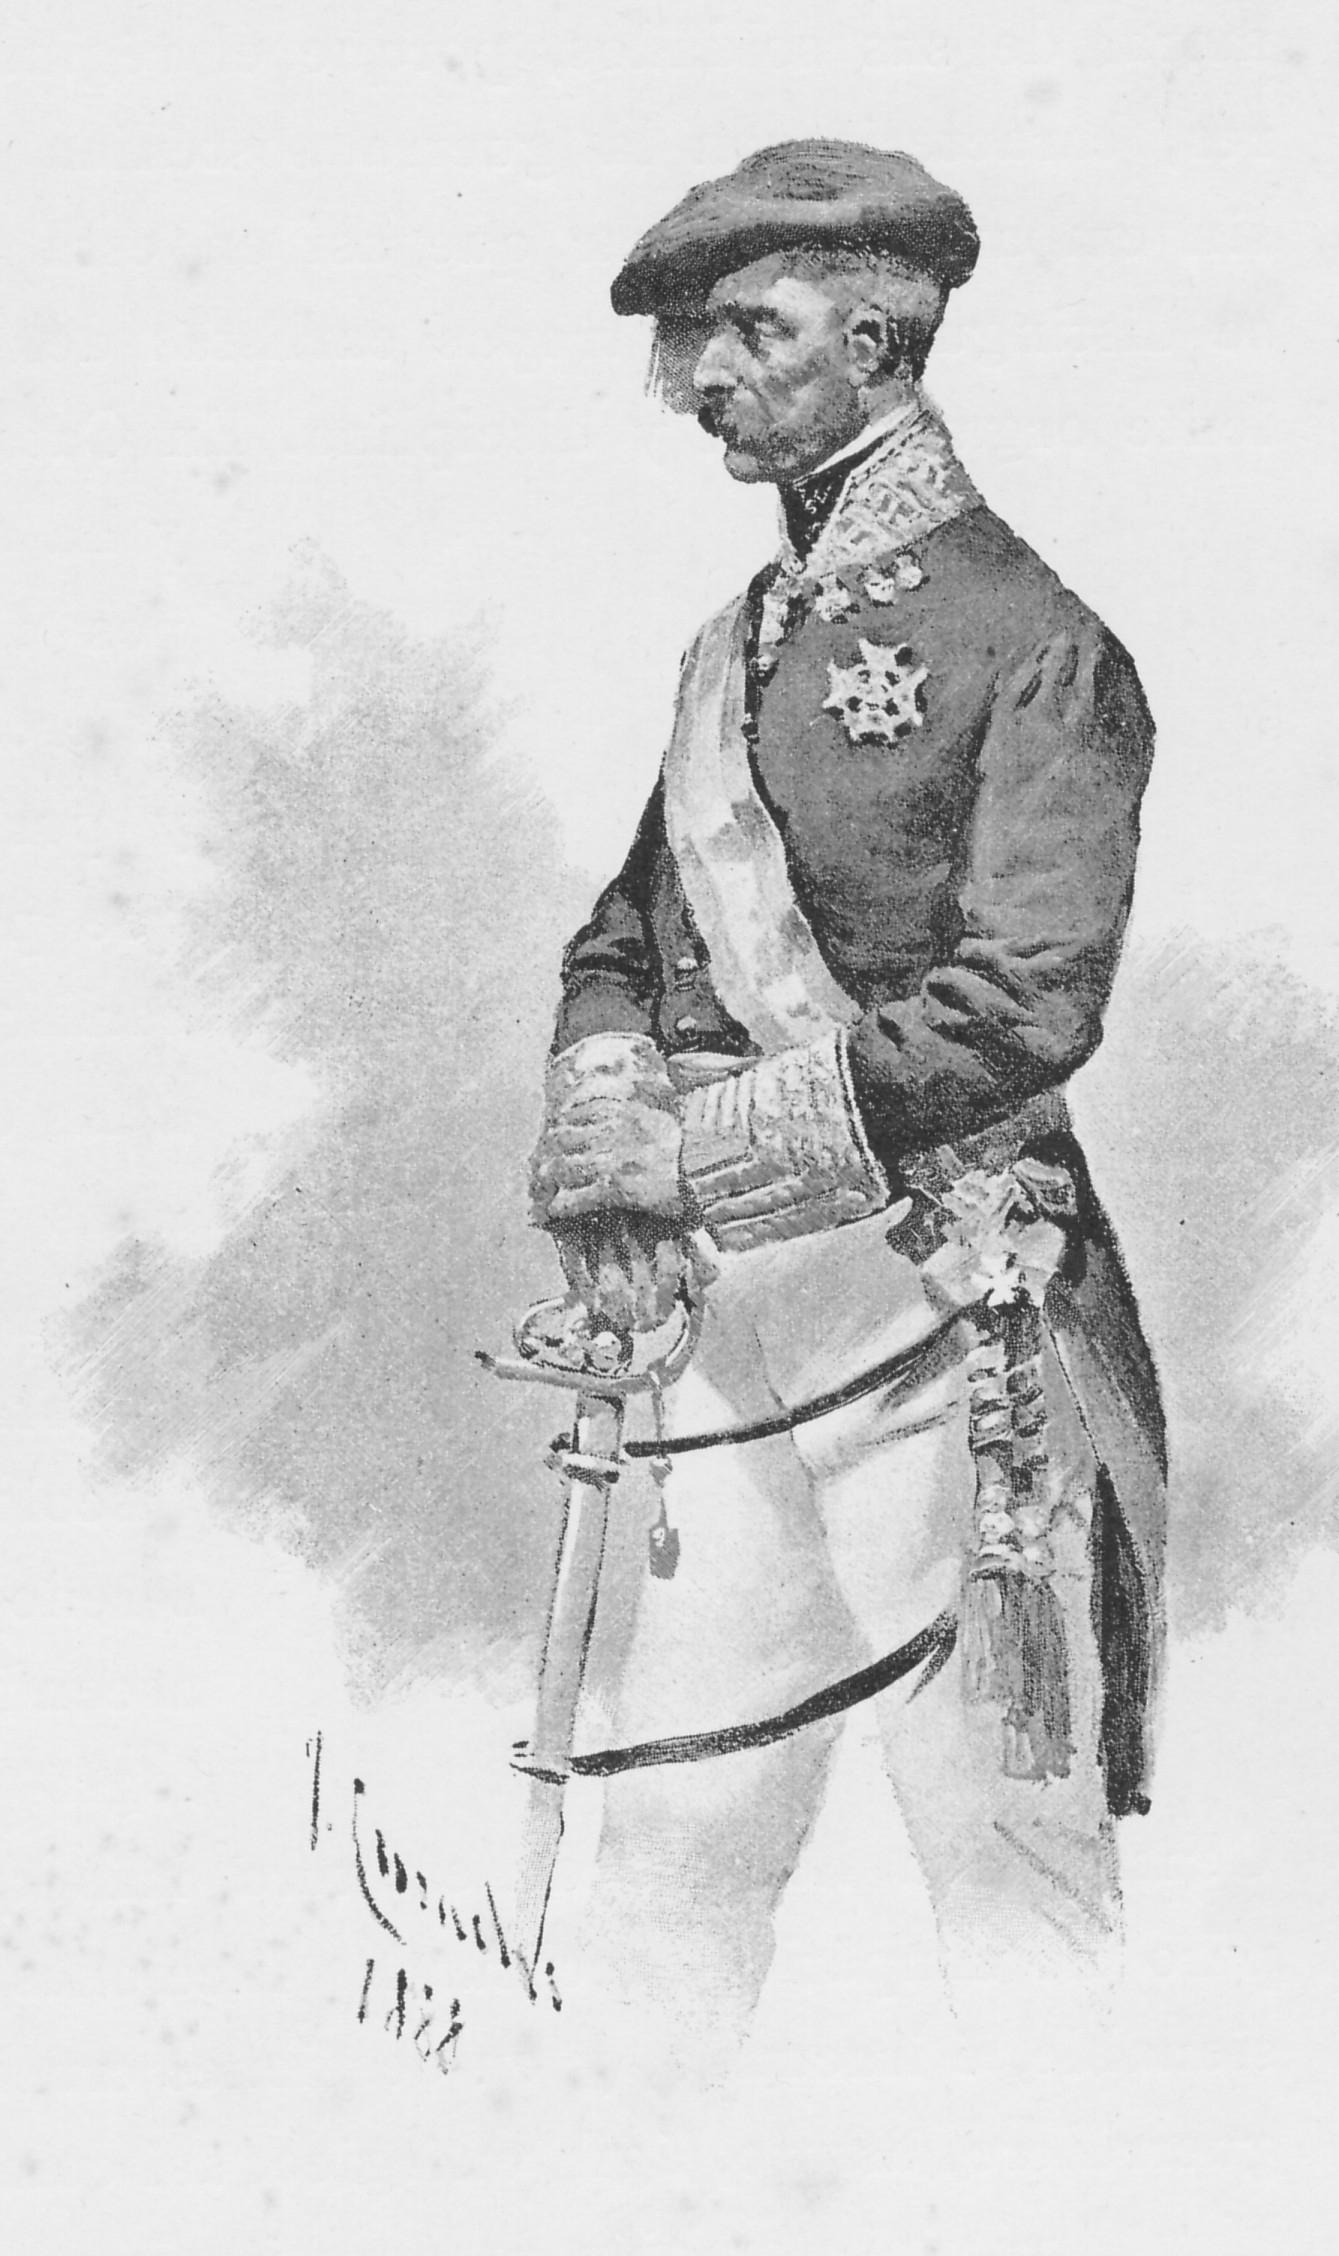 Tomas Zumalakarregi